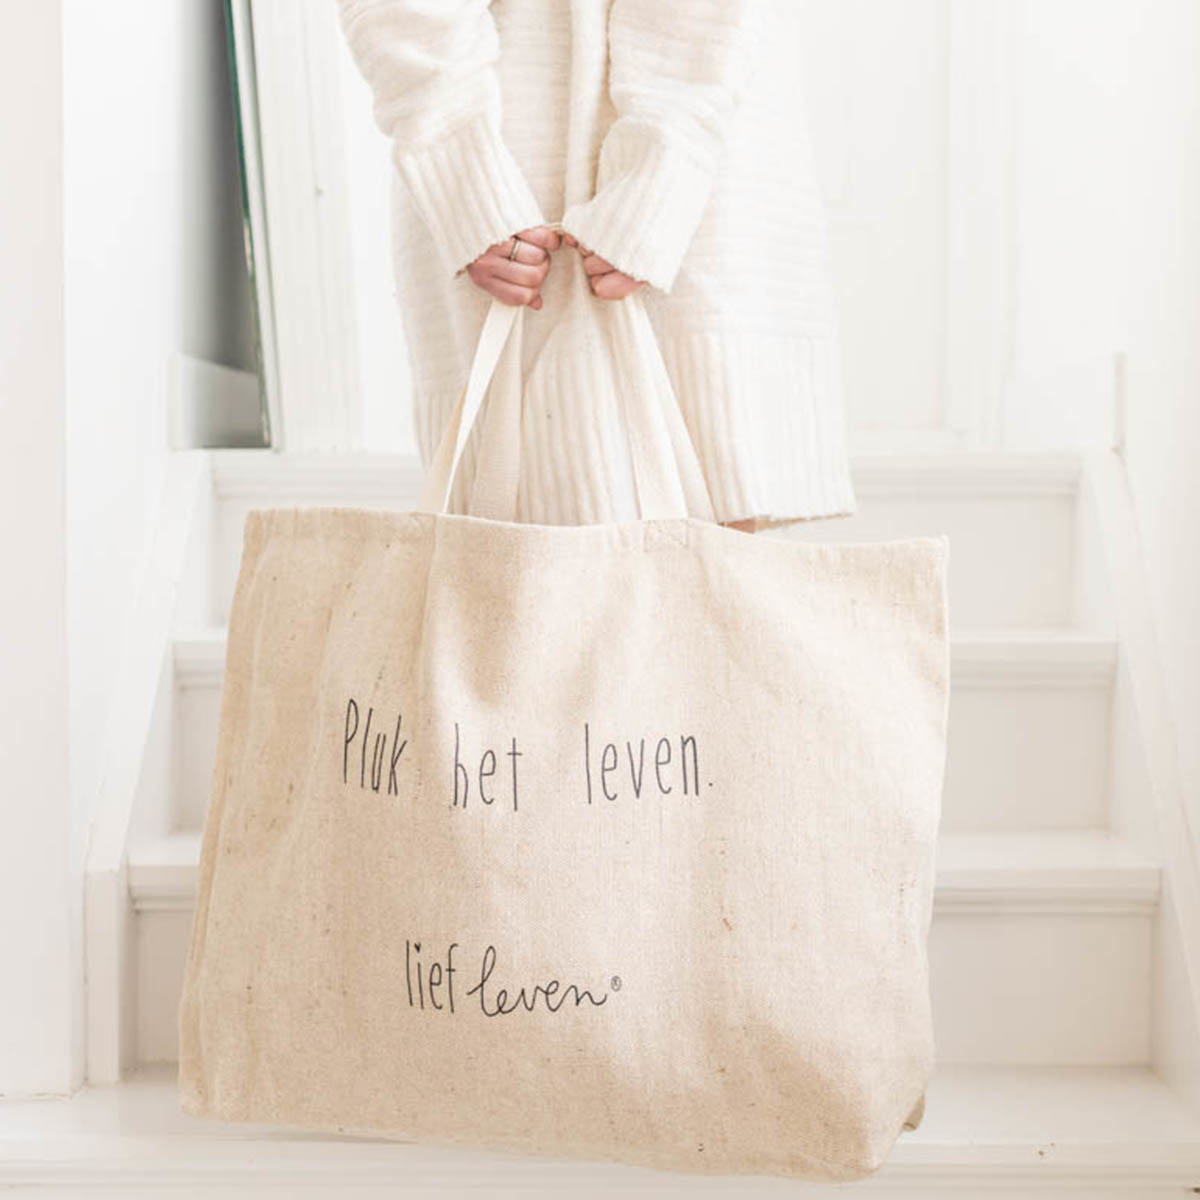 Grote shopper • Pluk het leven